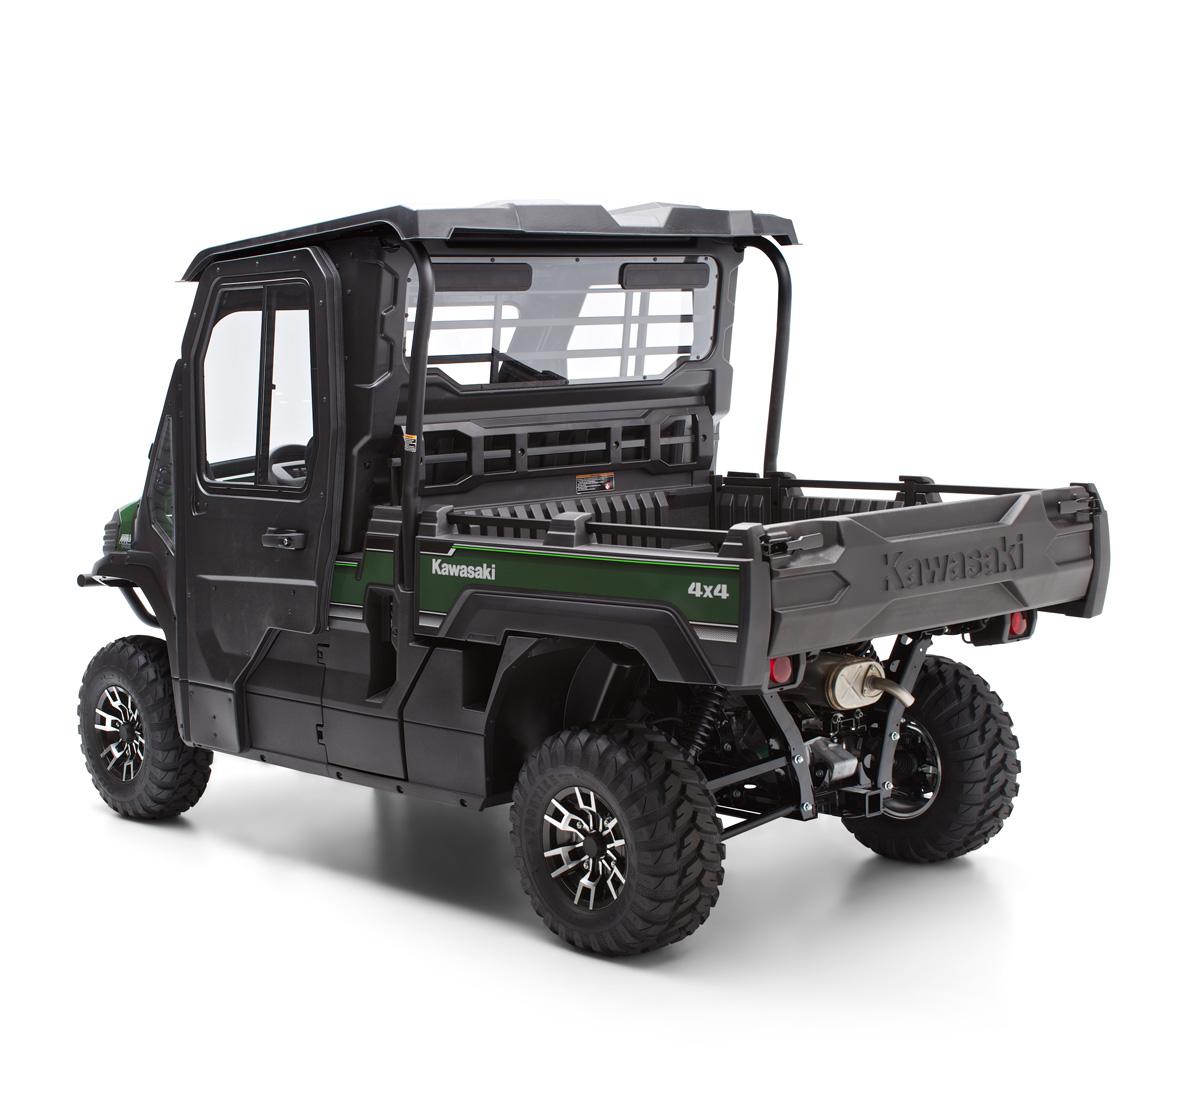 Kawasaki Teryx Cab Enclosure